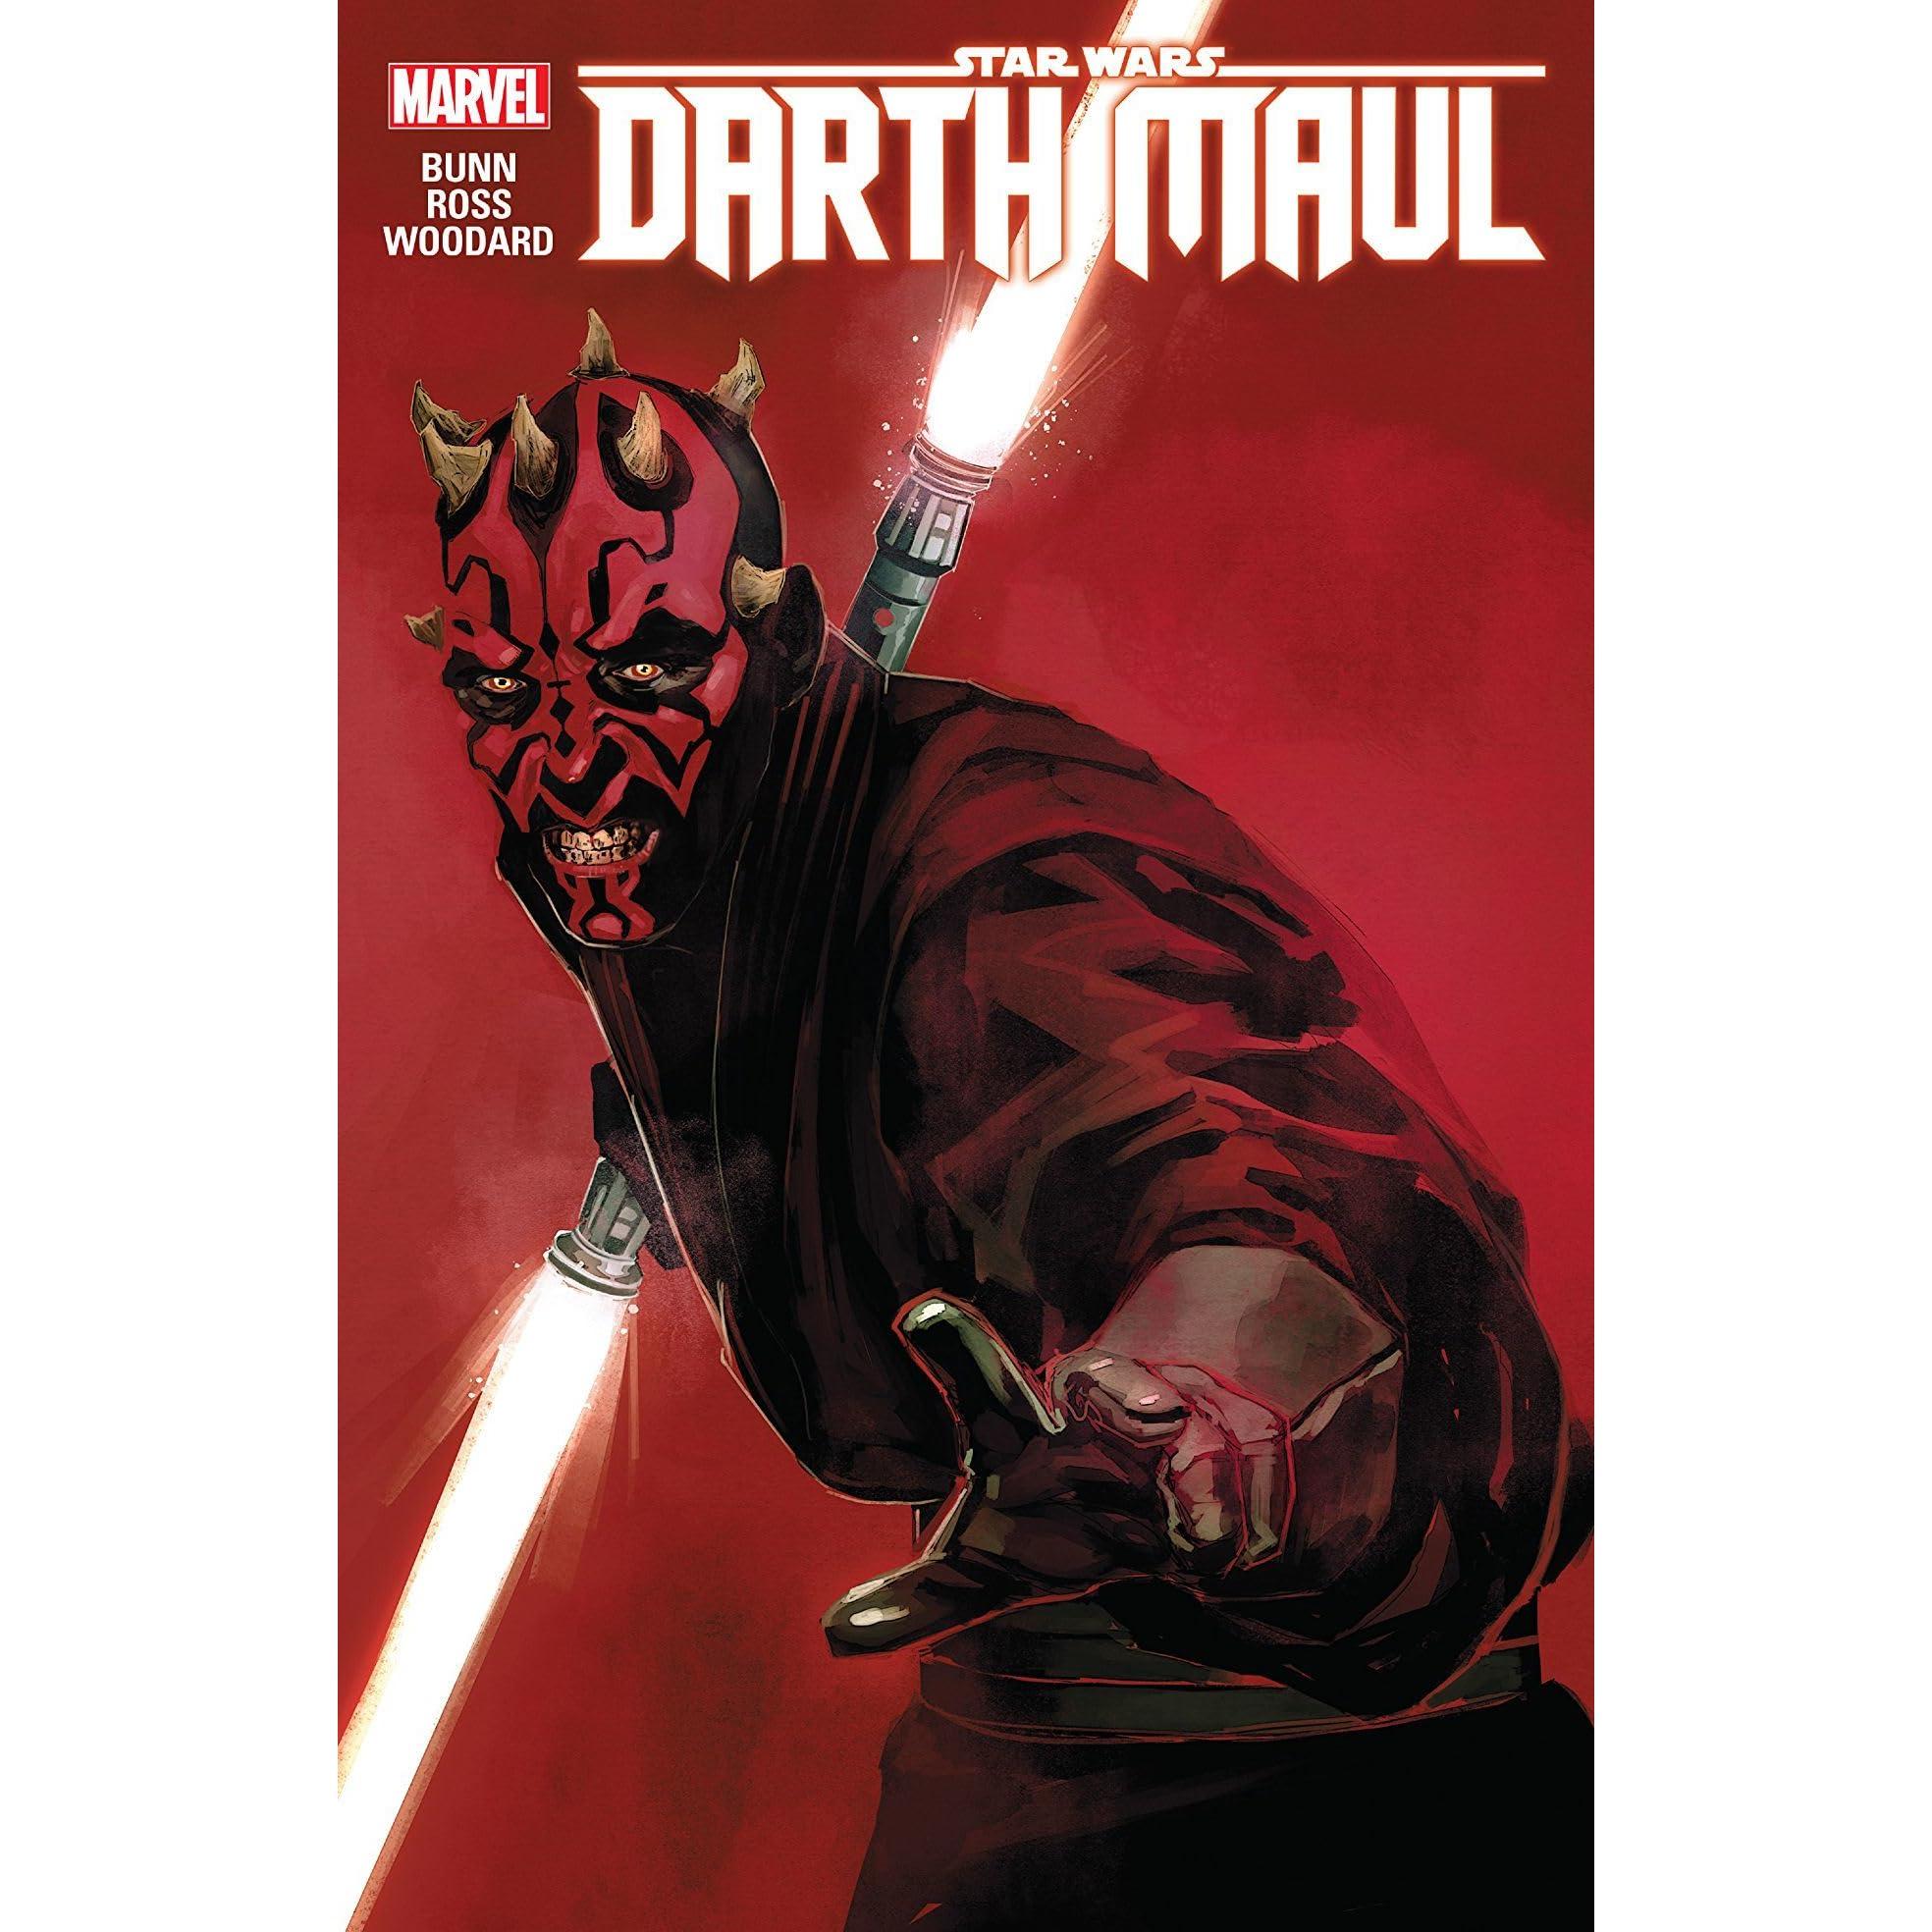 Star Wars Darth Maul By Cullen Bunn